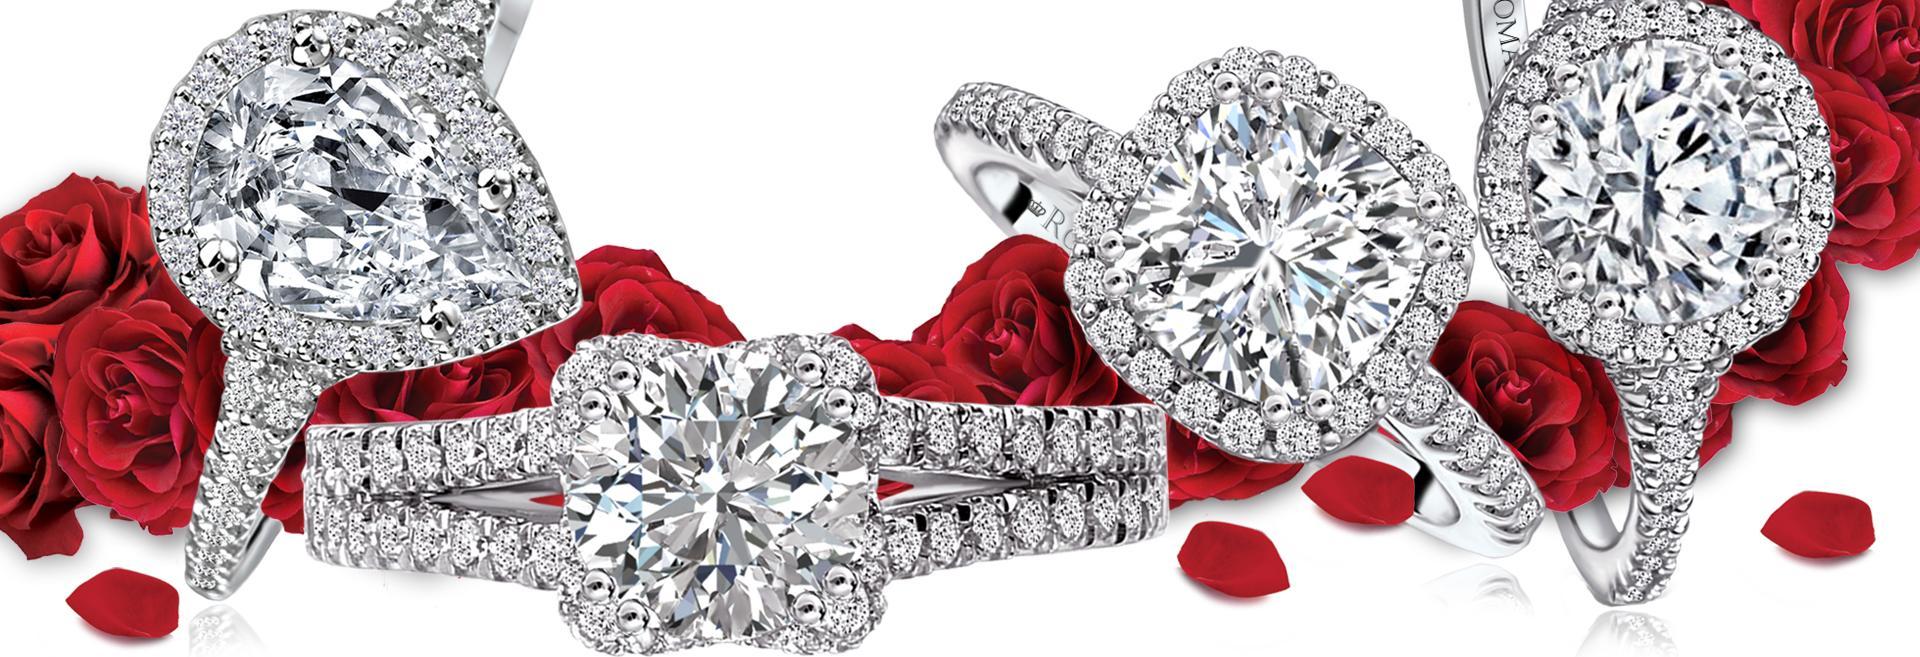 boyle jewelers diamond jewelry erlanger ky